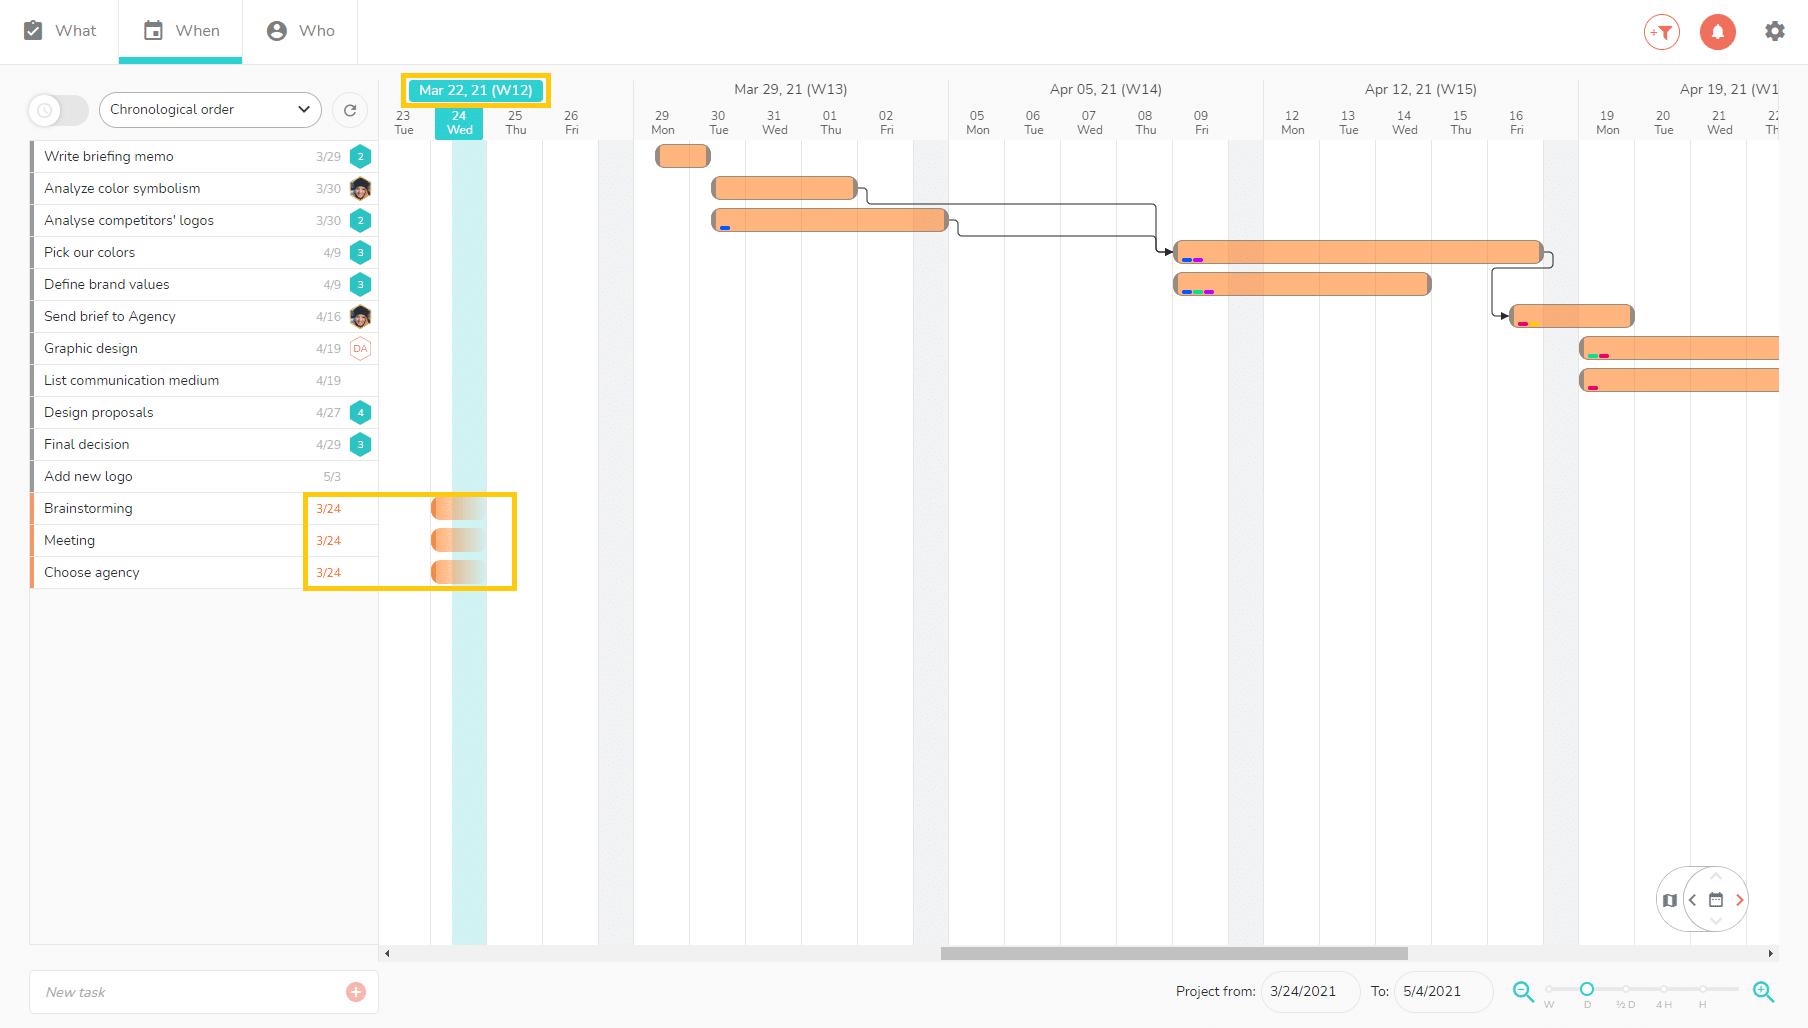 tasks scheduled directly on the gantt chart